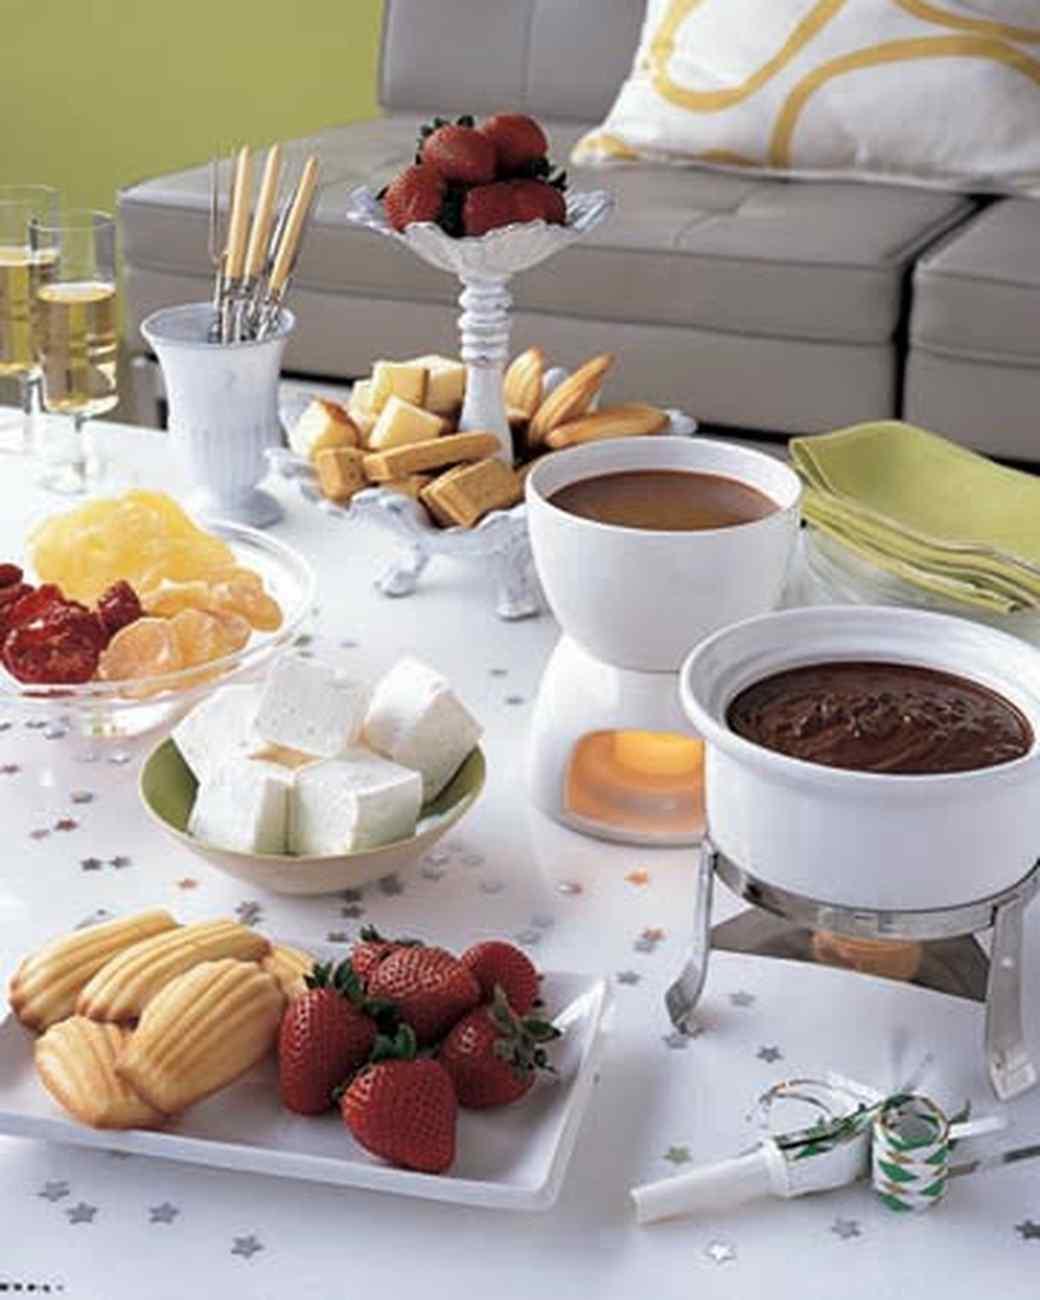 mx1203fobc6_1203_caramel_fondue.jpg